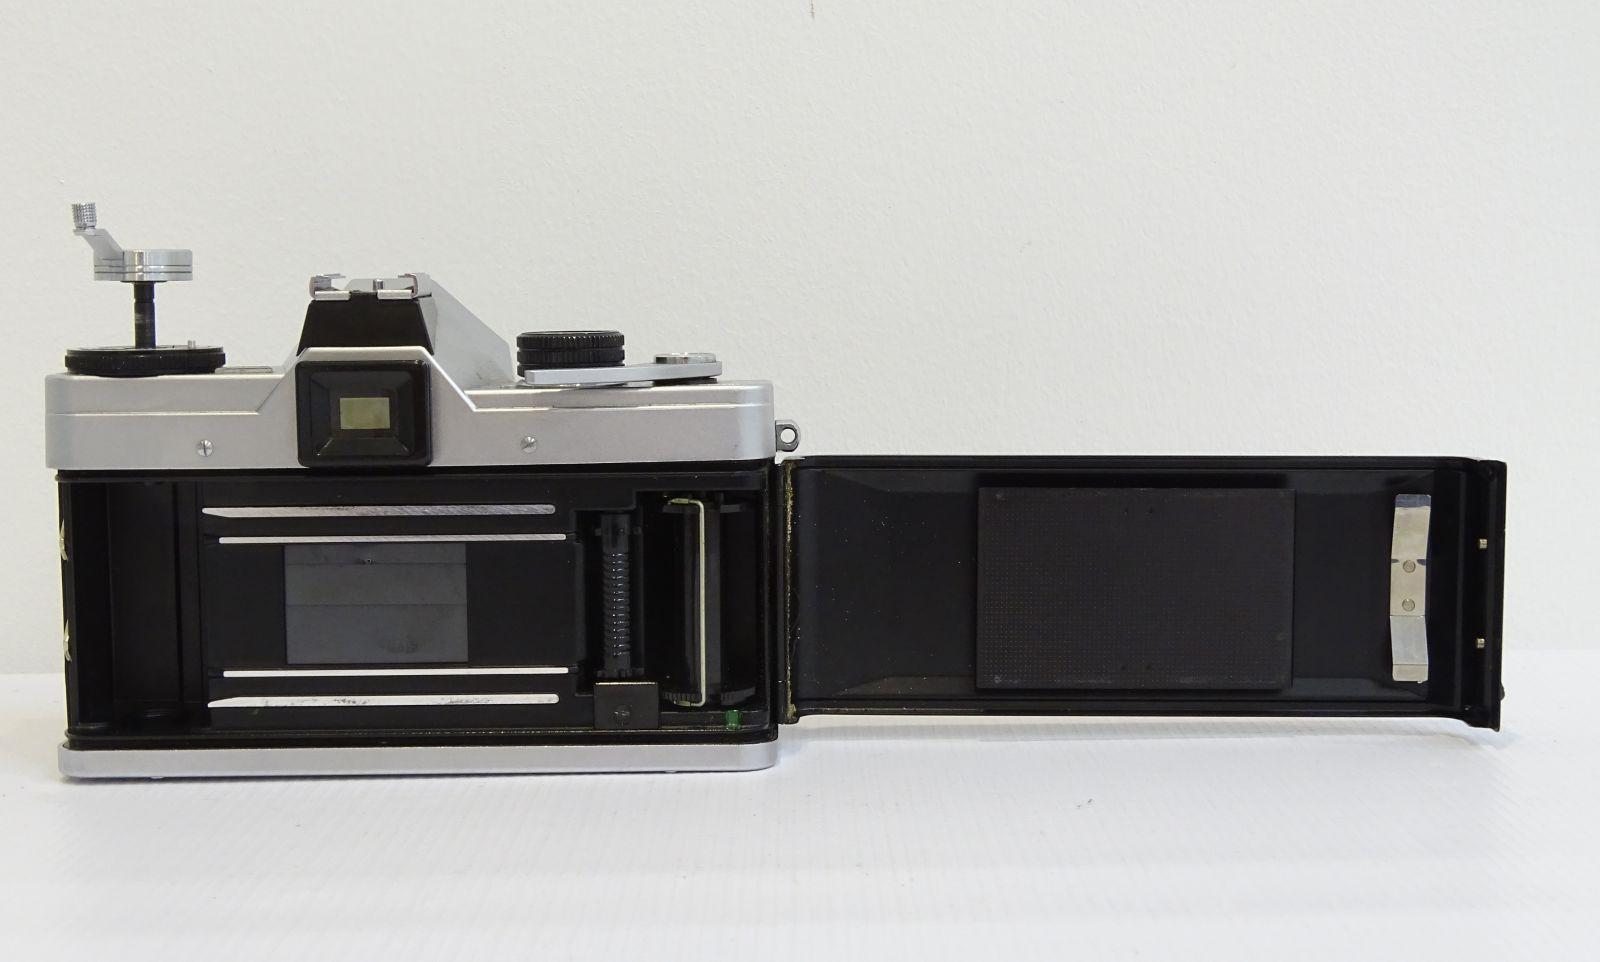 DSC00689.JPG (1600�962)